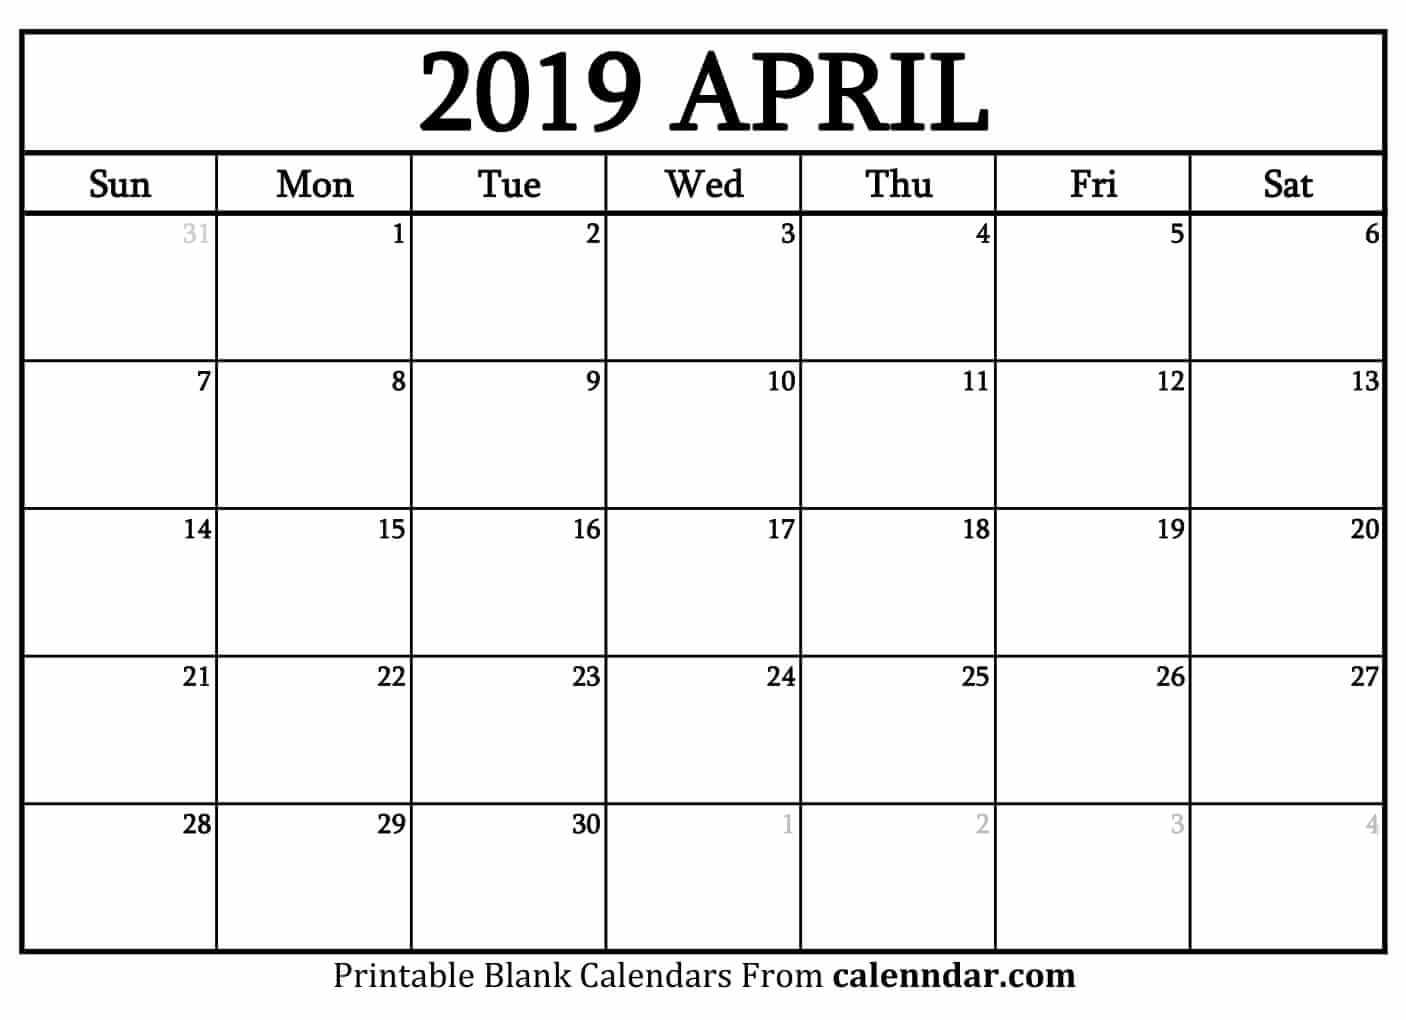 Blank April 2019 Calendar Templates Calenndar